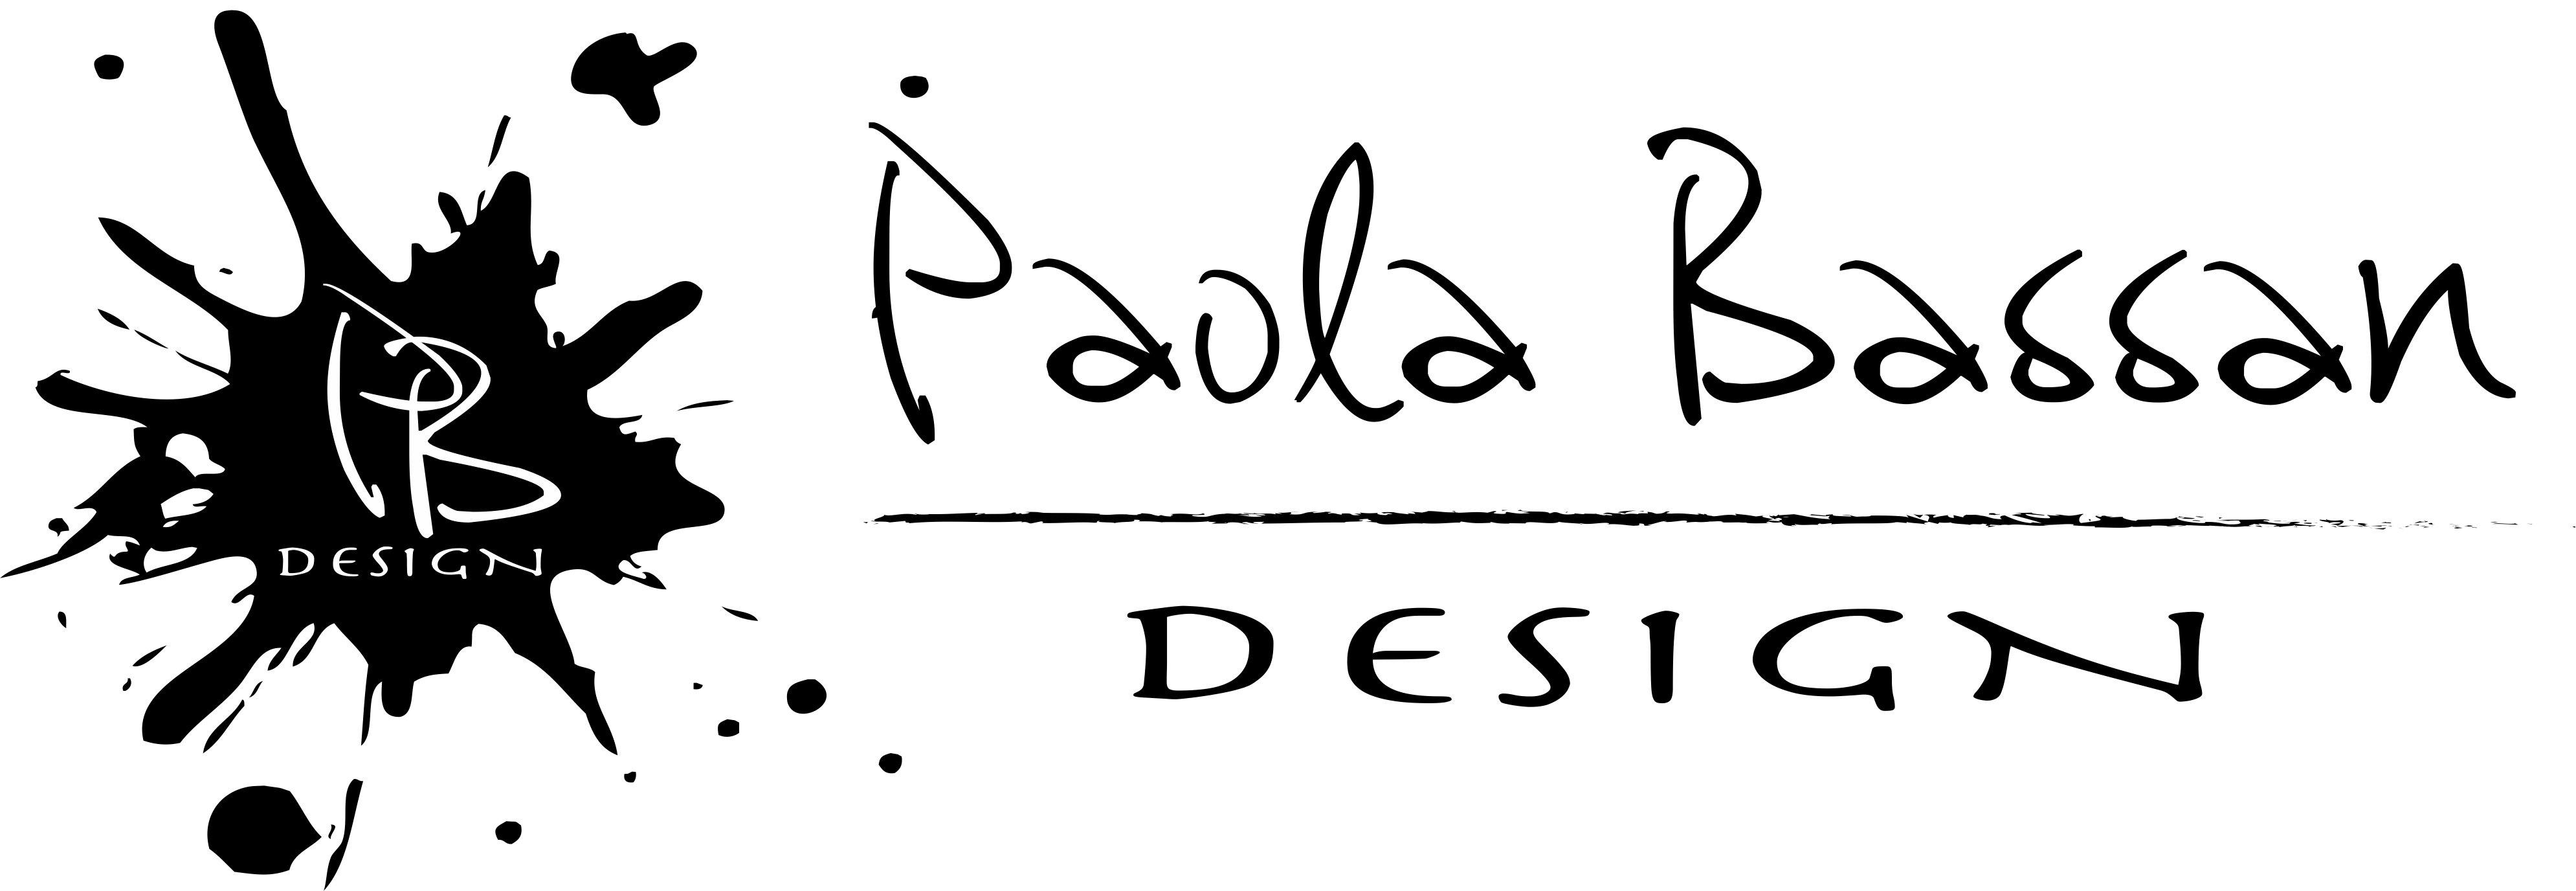 Paola Bassan Design